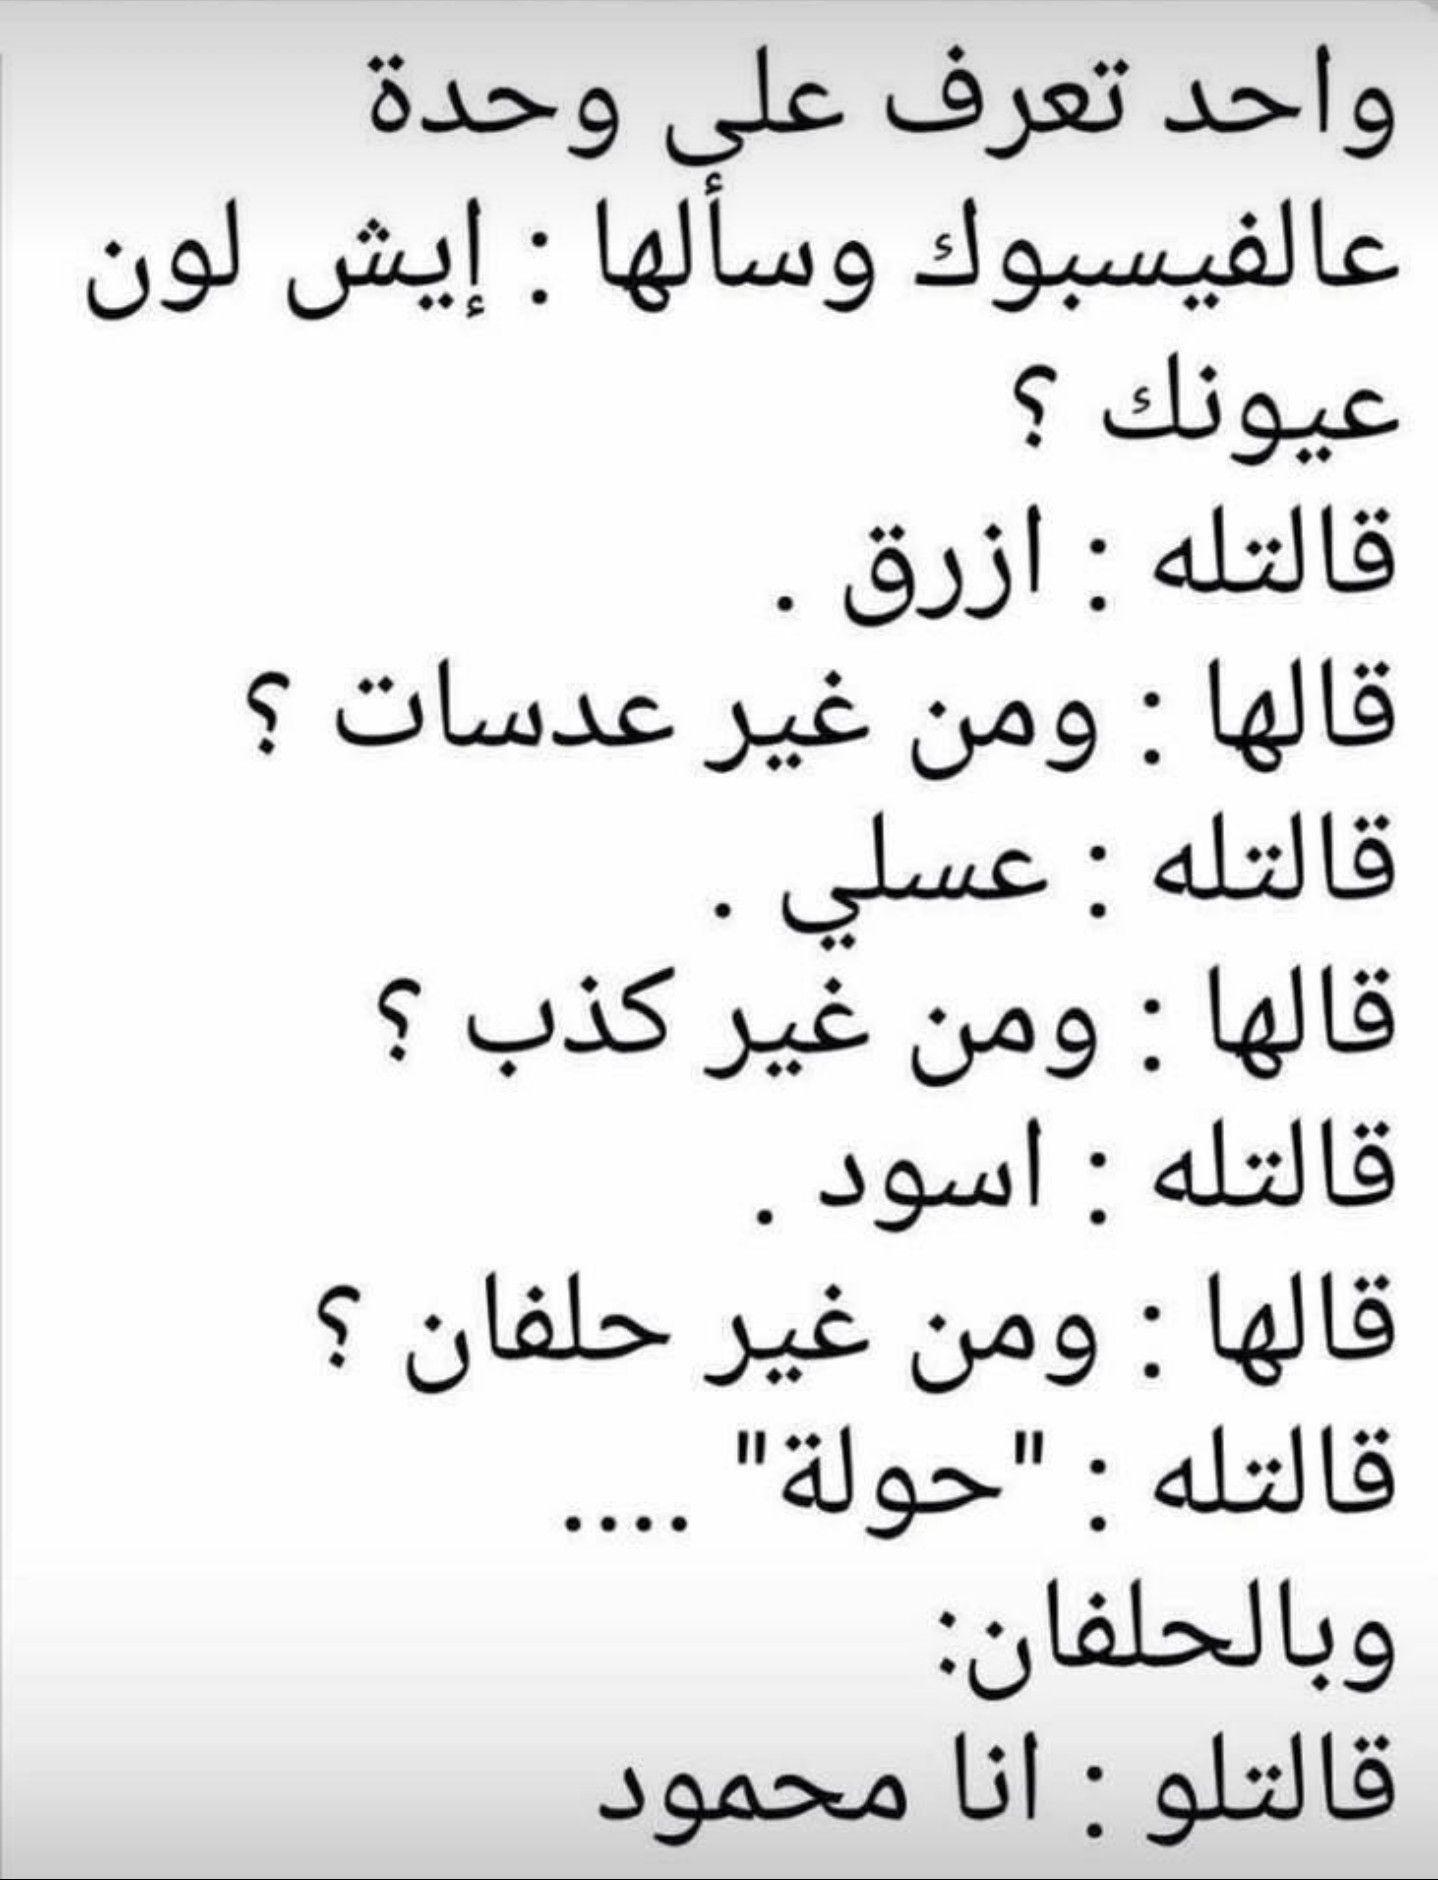 Pin By A M On ترفيه ونغاشة Funny Arabic Quotes Arabic Funny